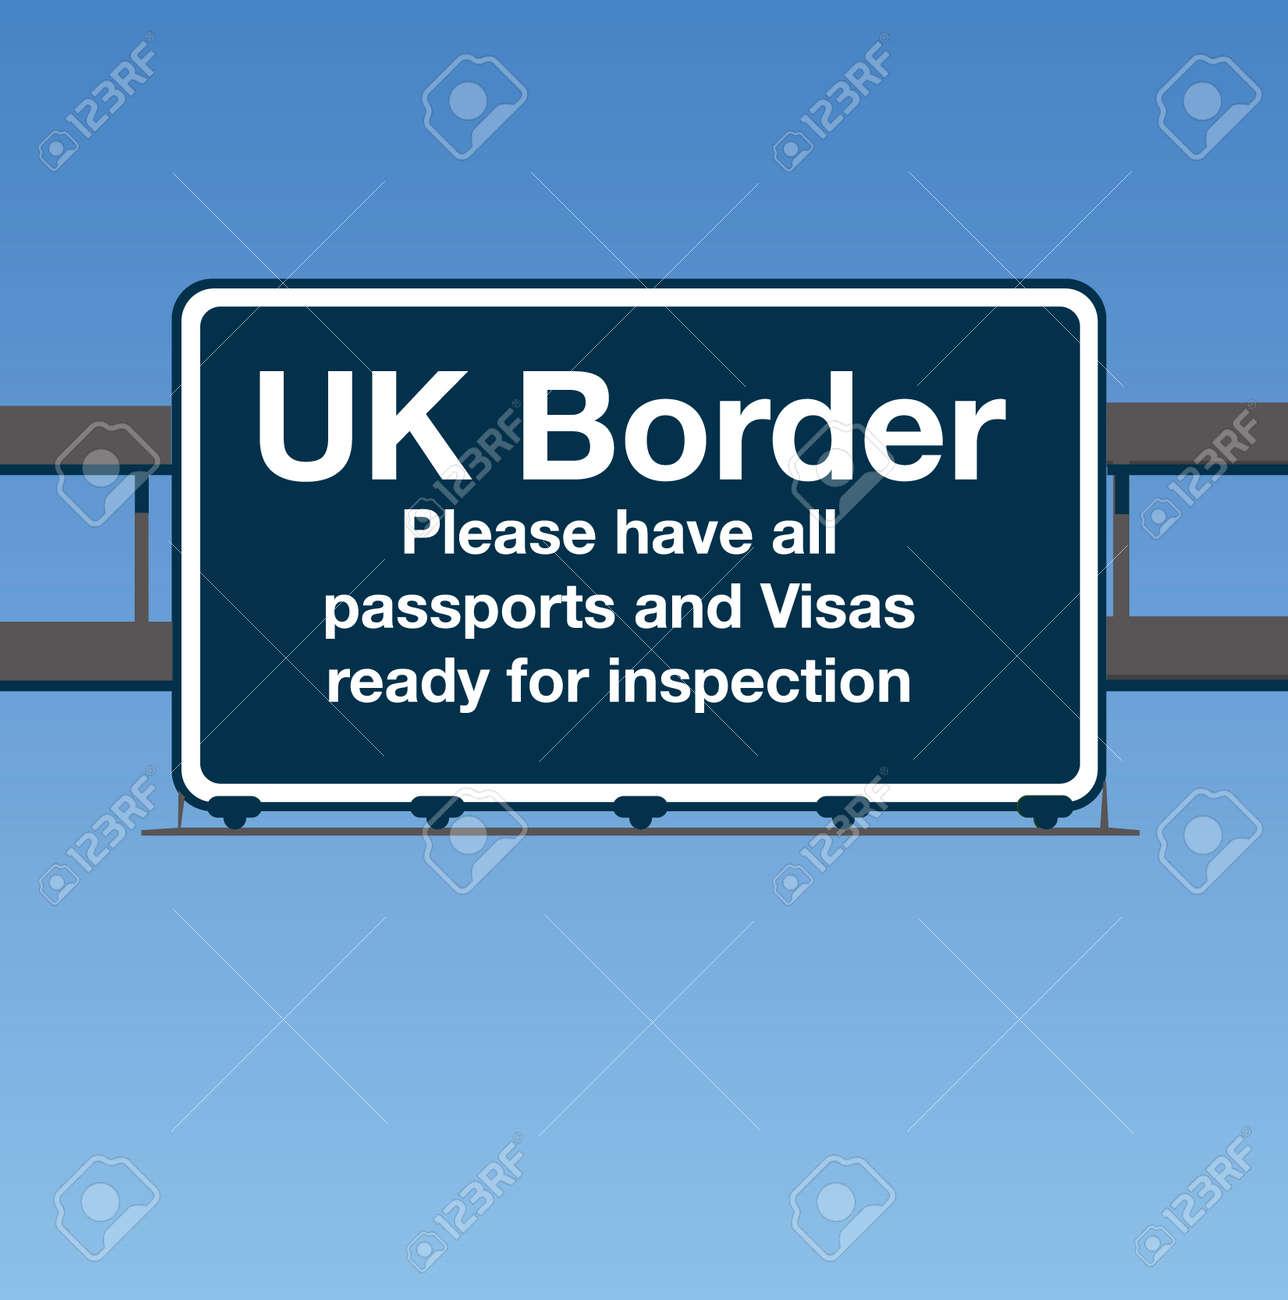 UK Border Road Sign - 57131041